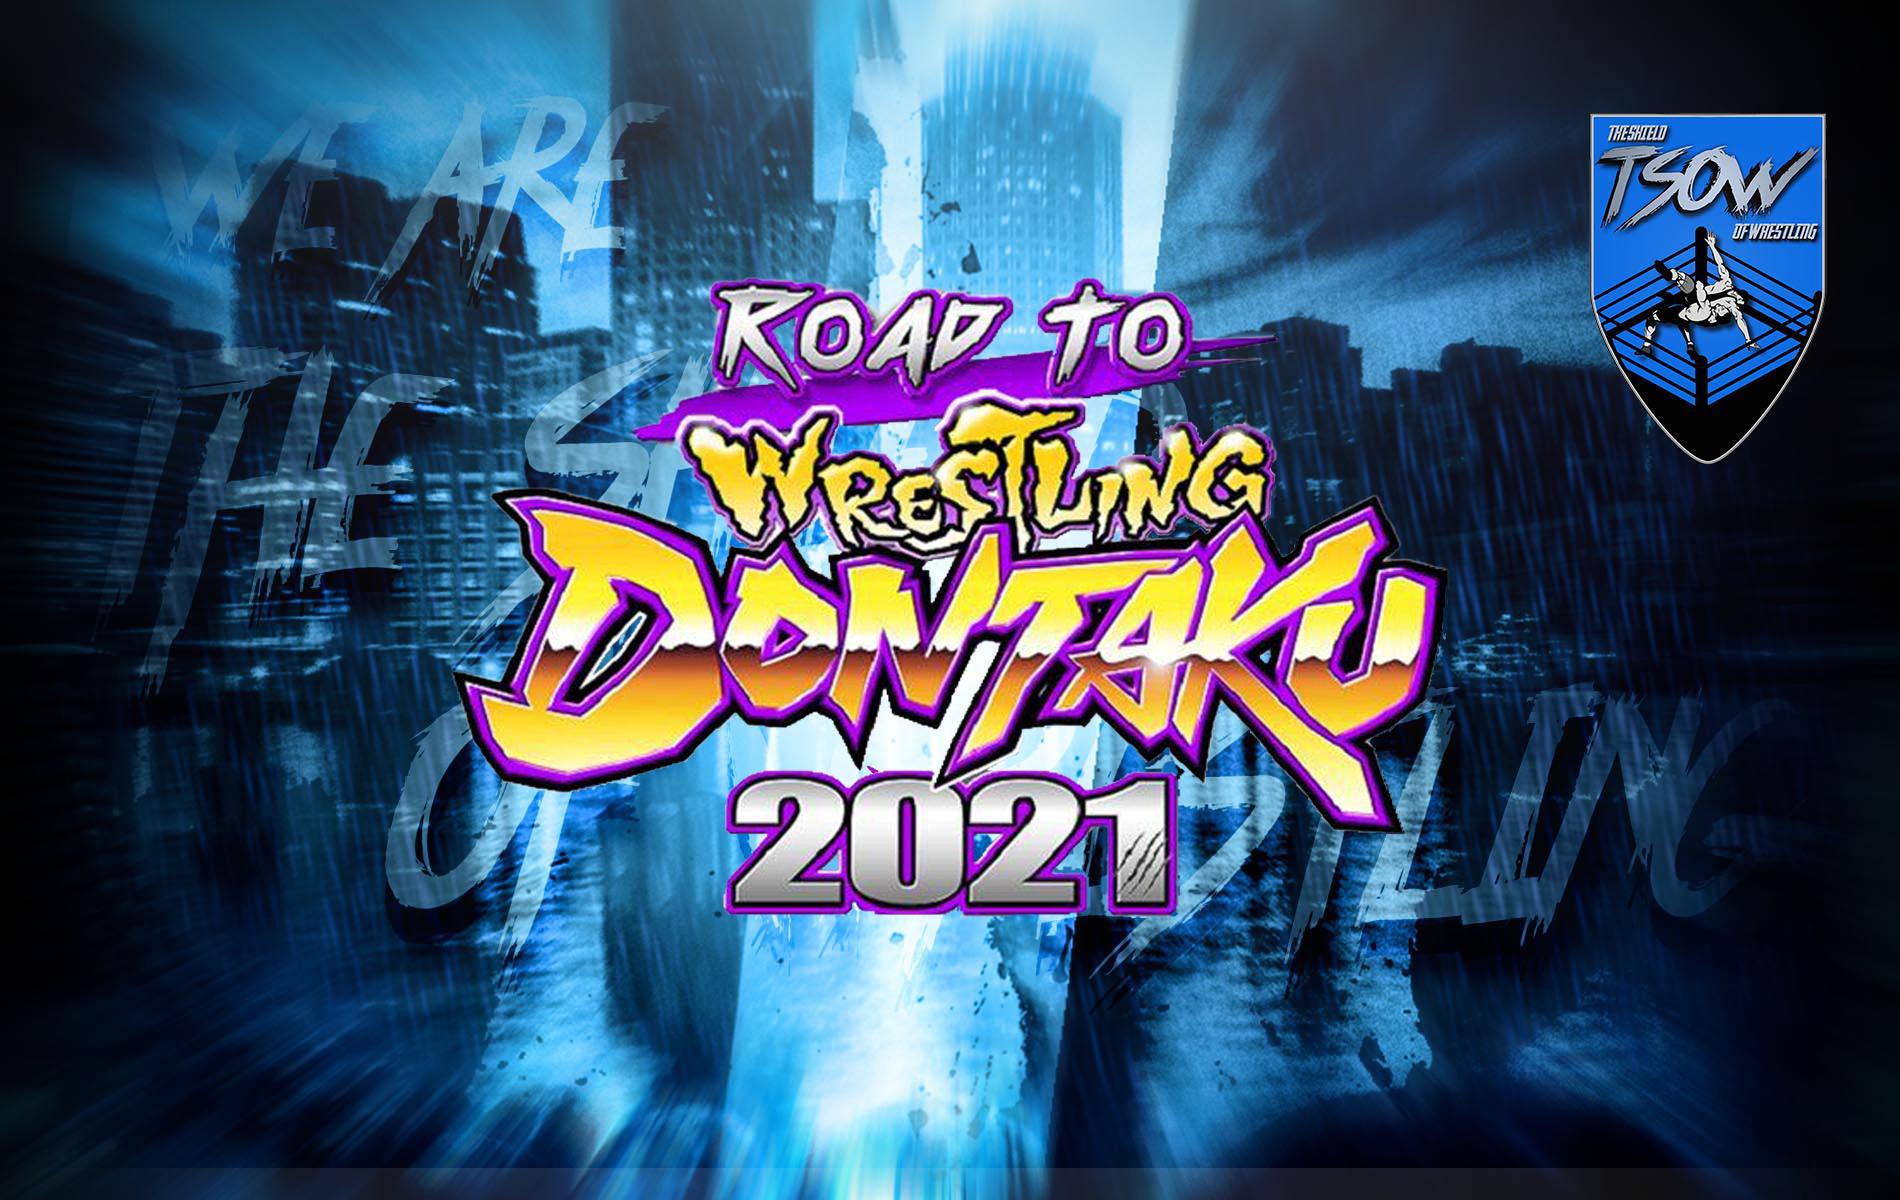 Risultati NJPW Road to Wrestling Dontaku 2021 - Day 6